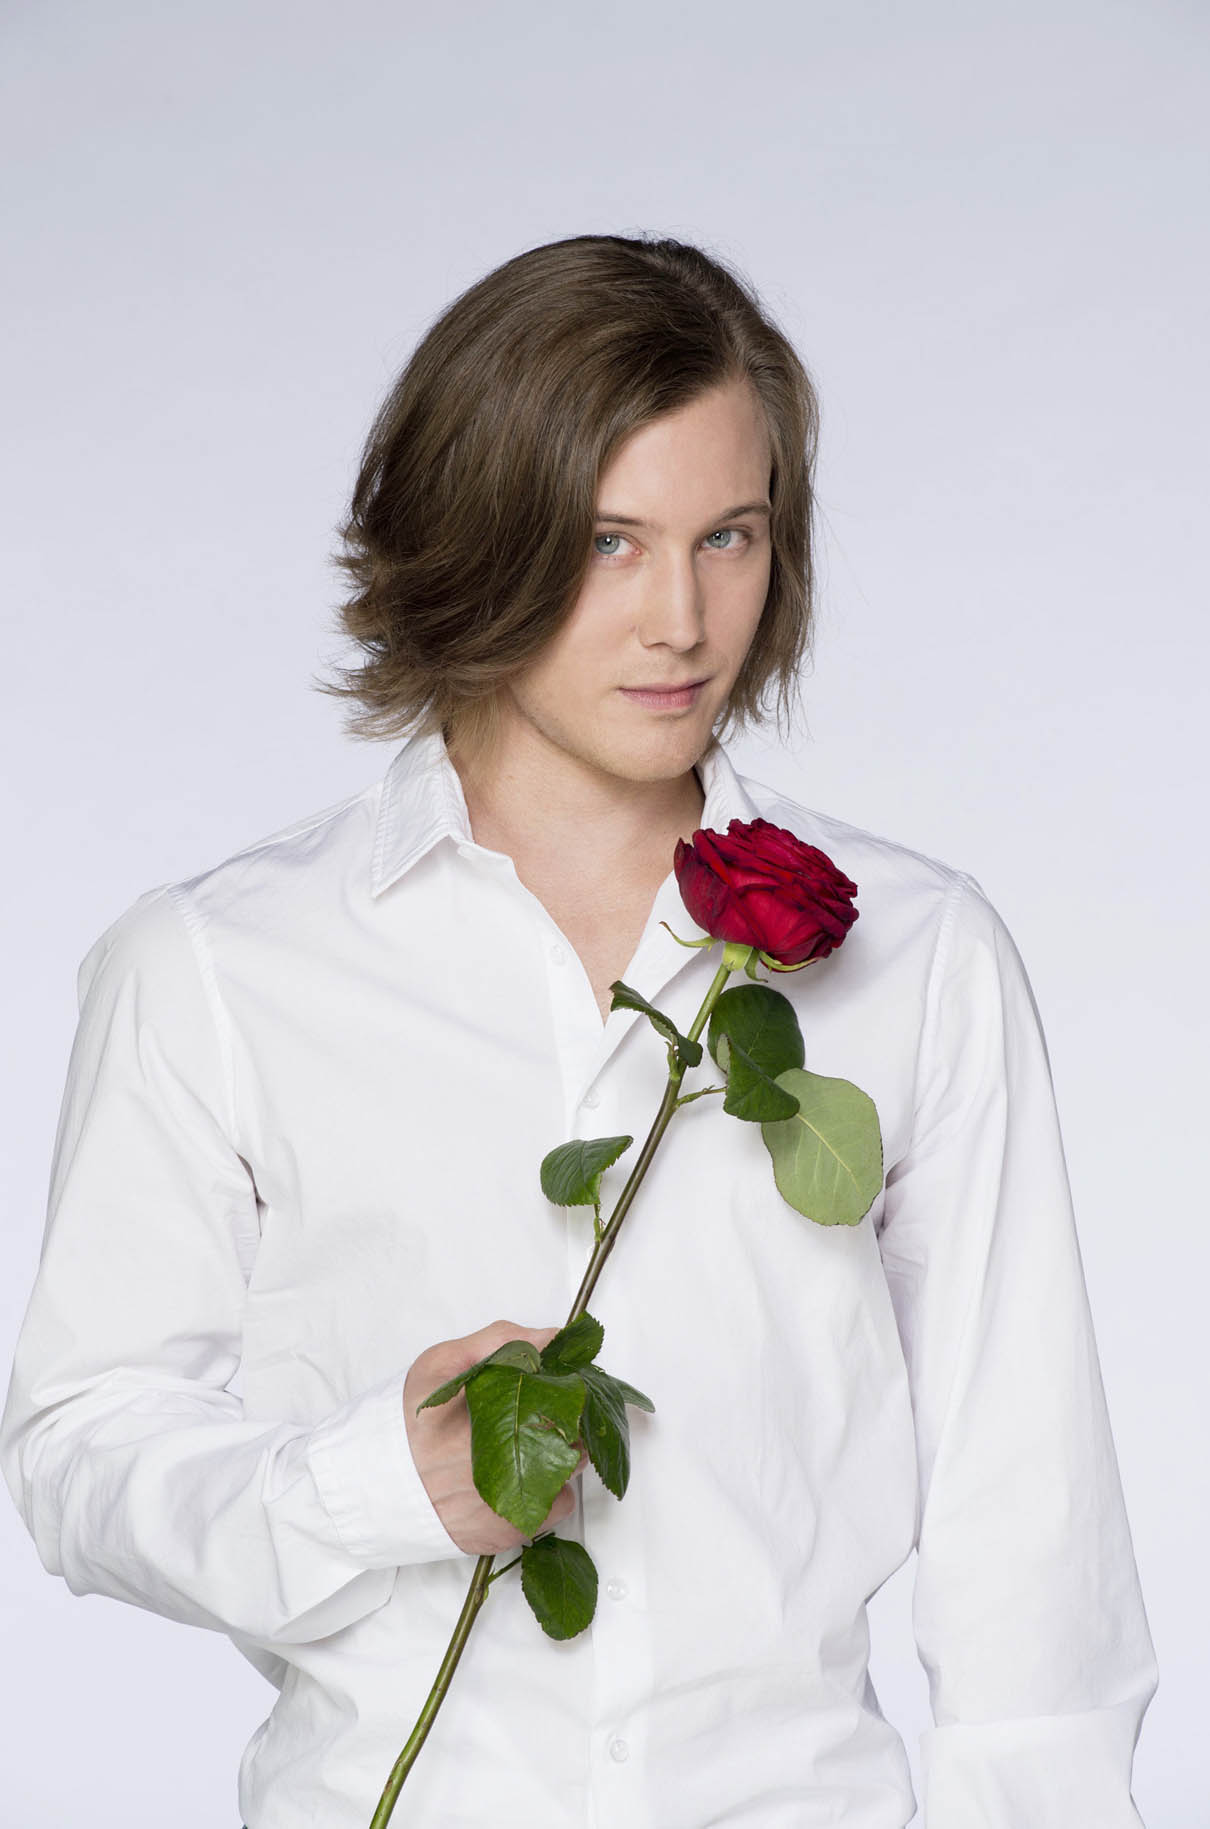 rote rosen letzte folge sehen